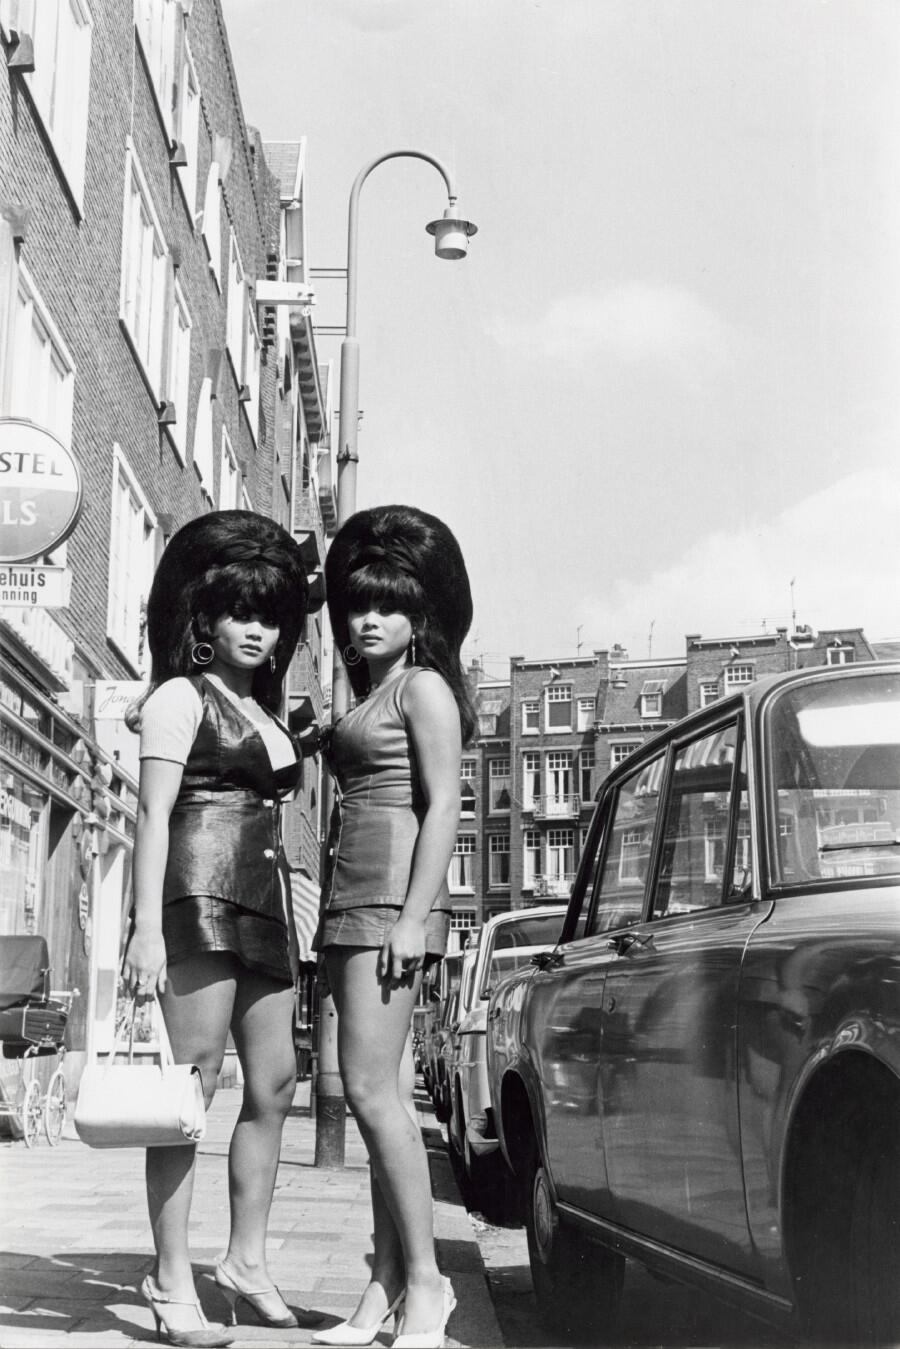 RT @chrisdeerin: Proper twins, proper hair RT @HistoryInPics: Amsterdam, 1960s http://t.co/xeYsjjKxWc